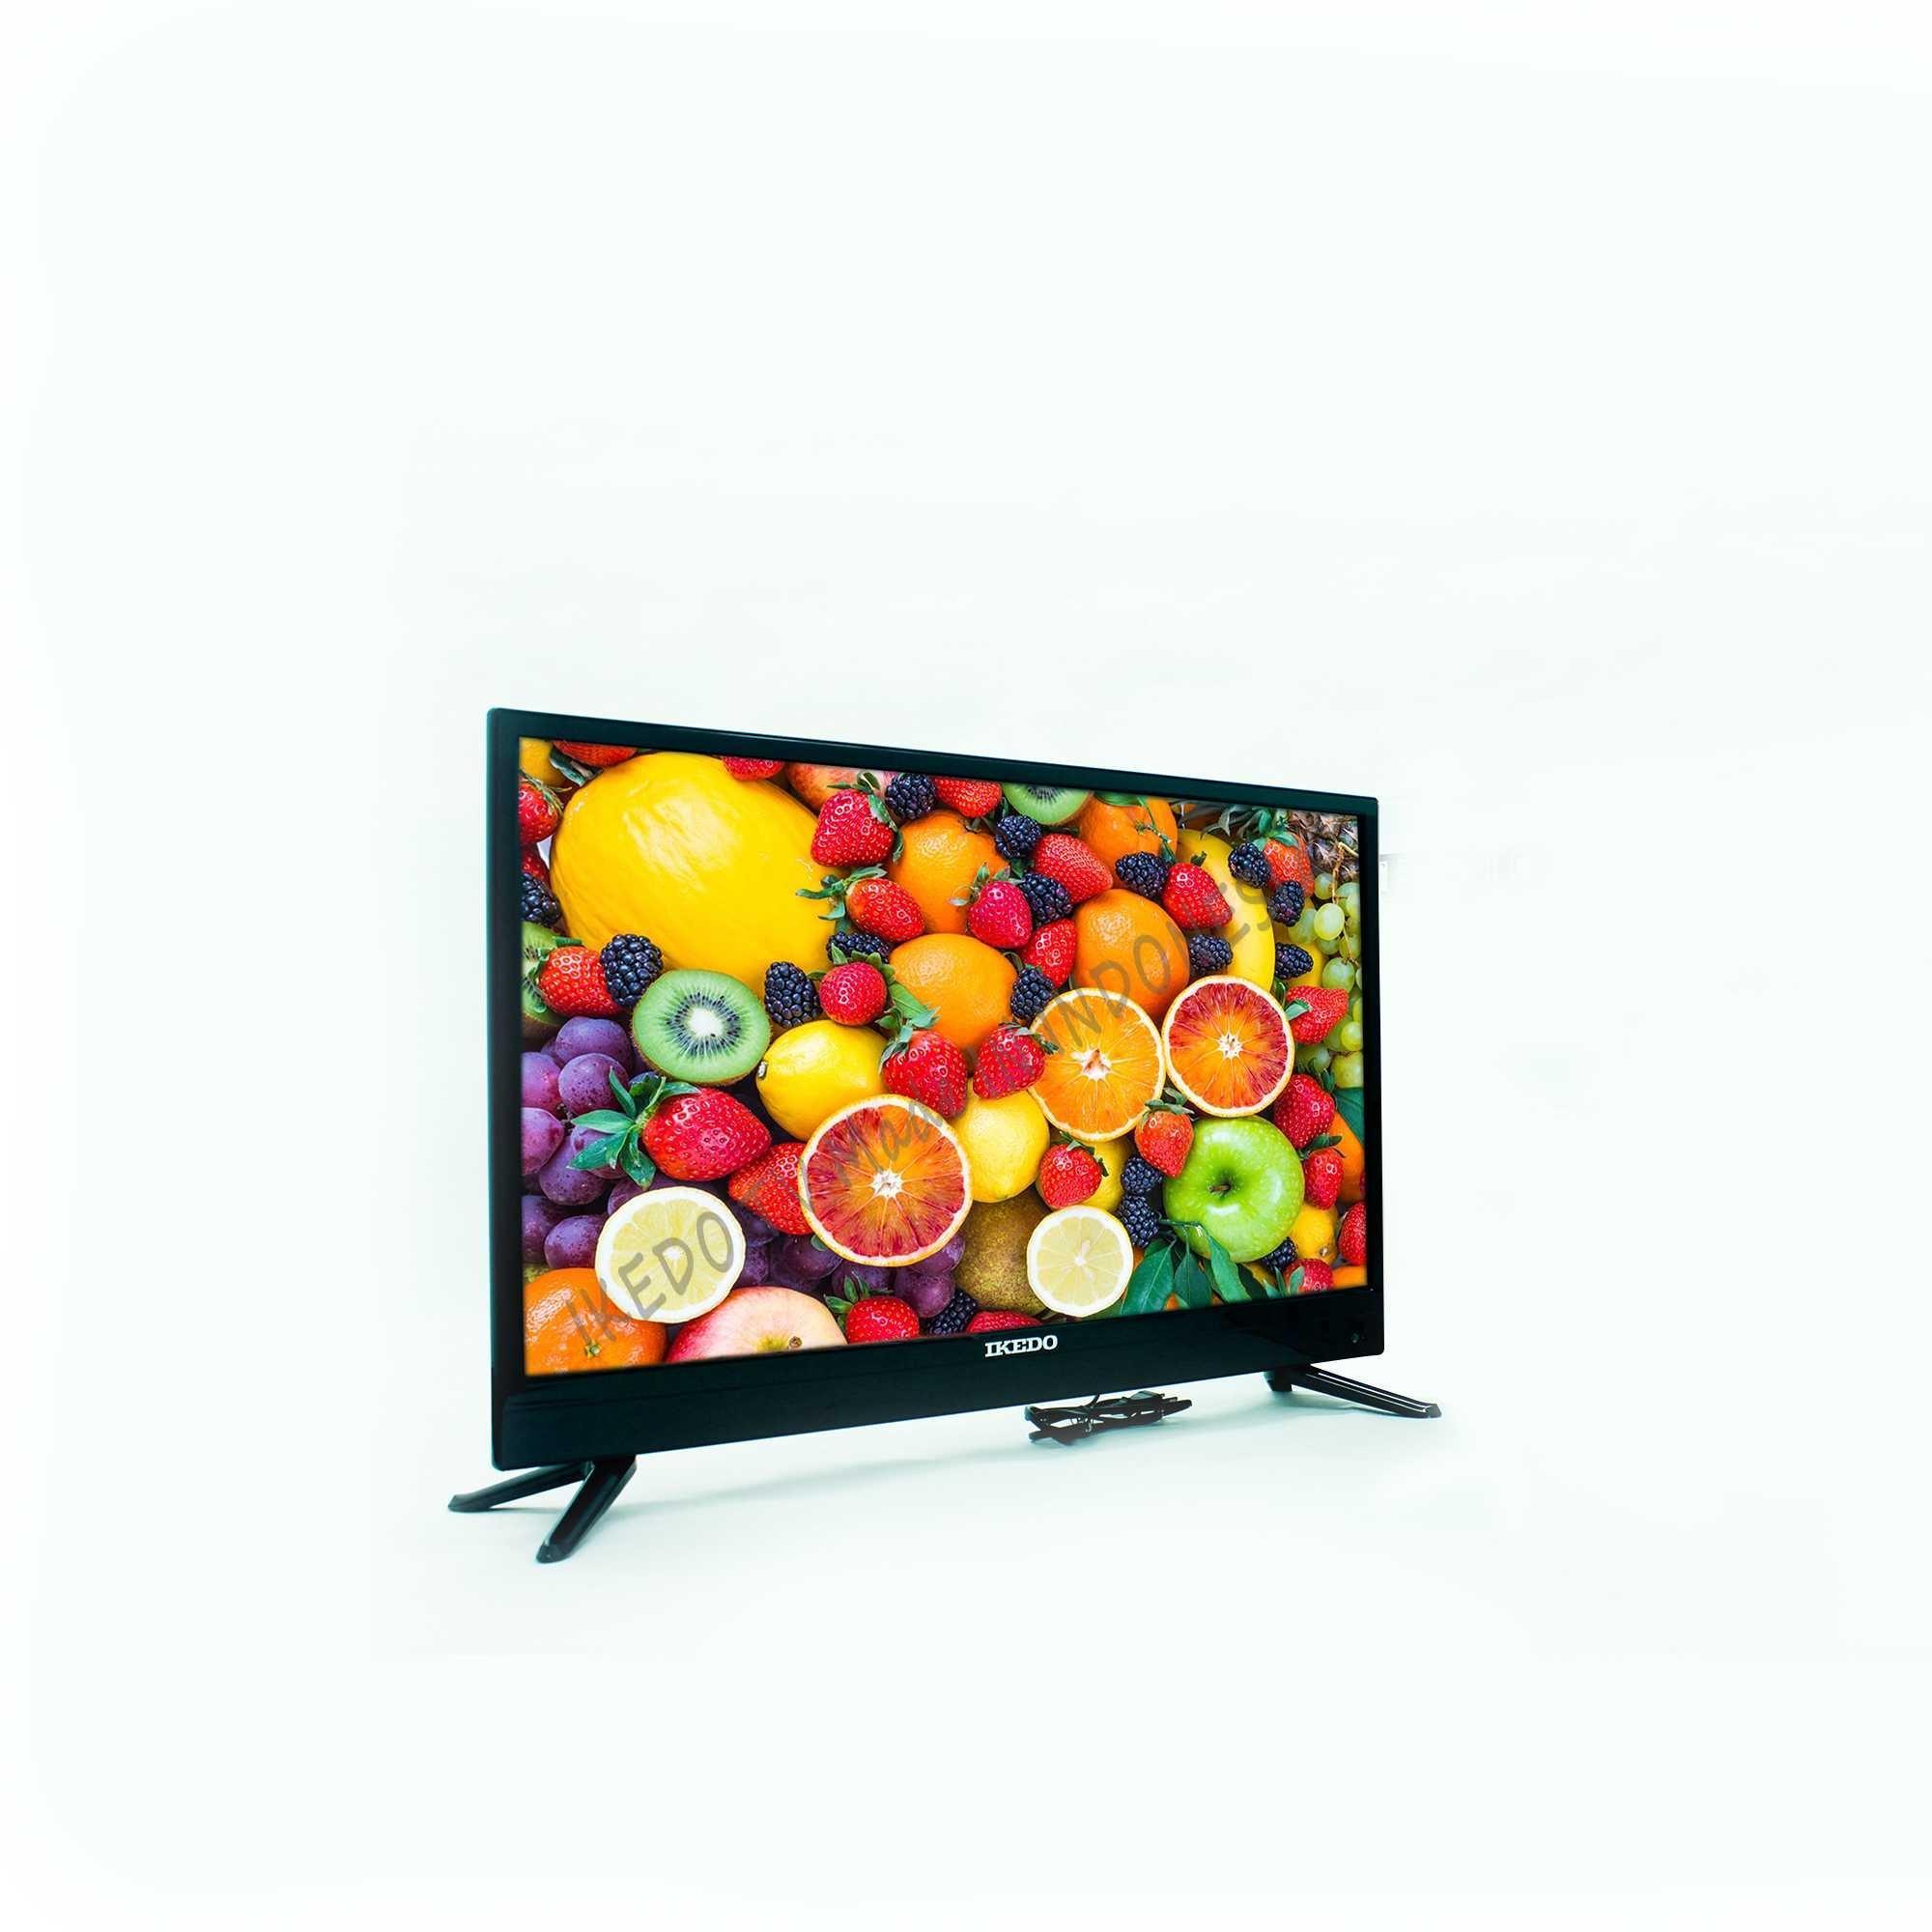 Ikedo Led Tv 17 Inch Hitam Daftar Harga Terbaru Indonesia Terlengkap 32 M1a Dolby Surround Sytema Gratis Powerstrip Huntkey Sga301 Lt 32m1 4